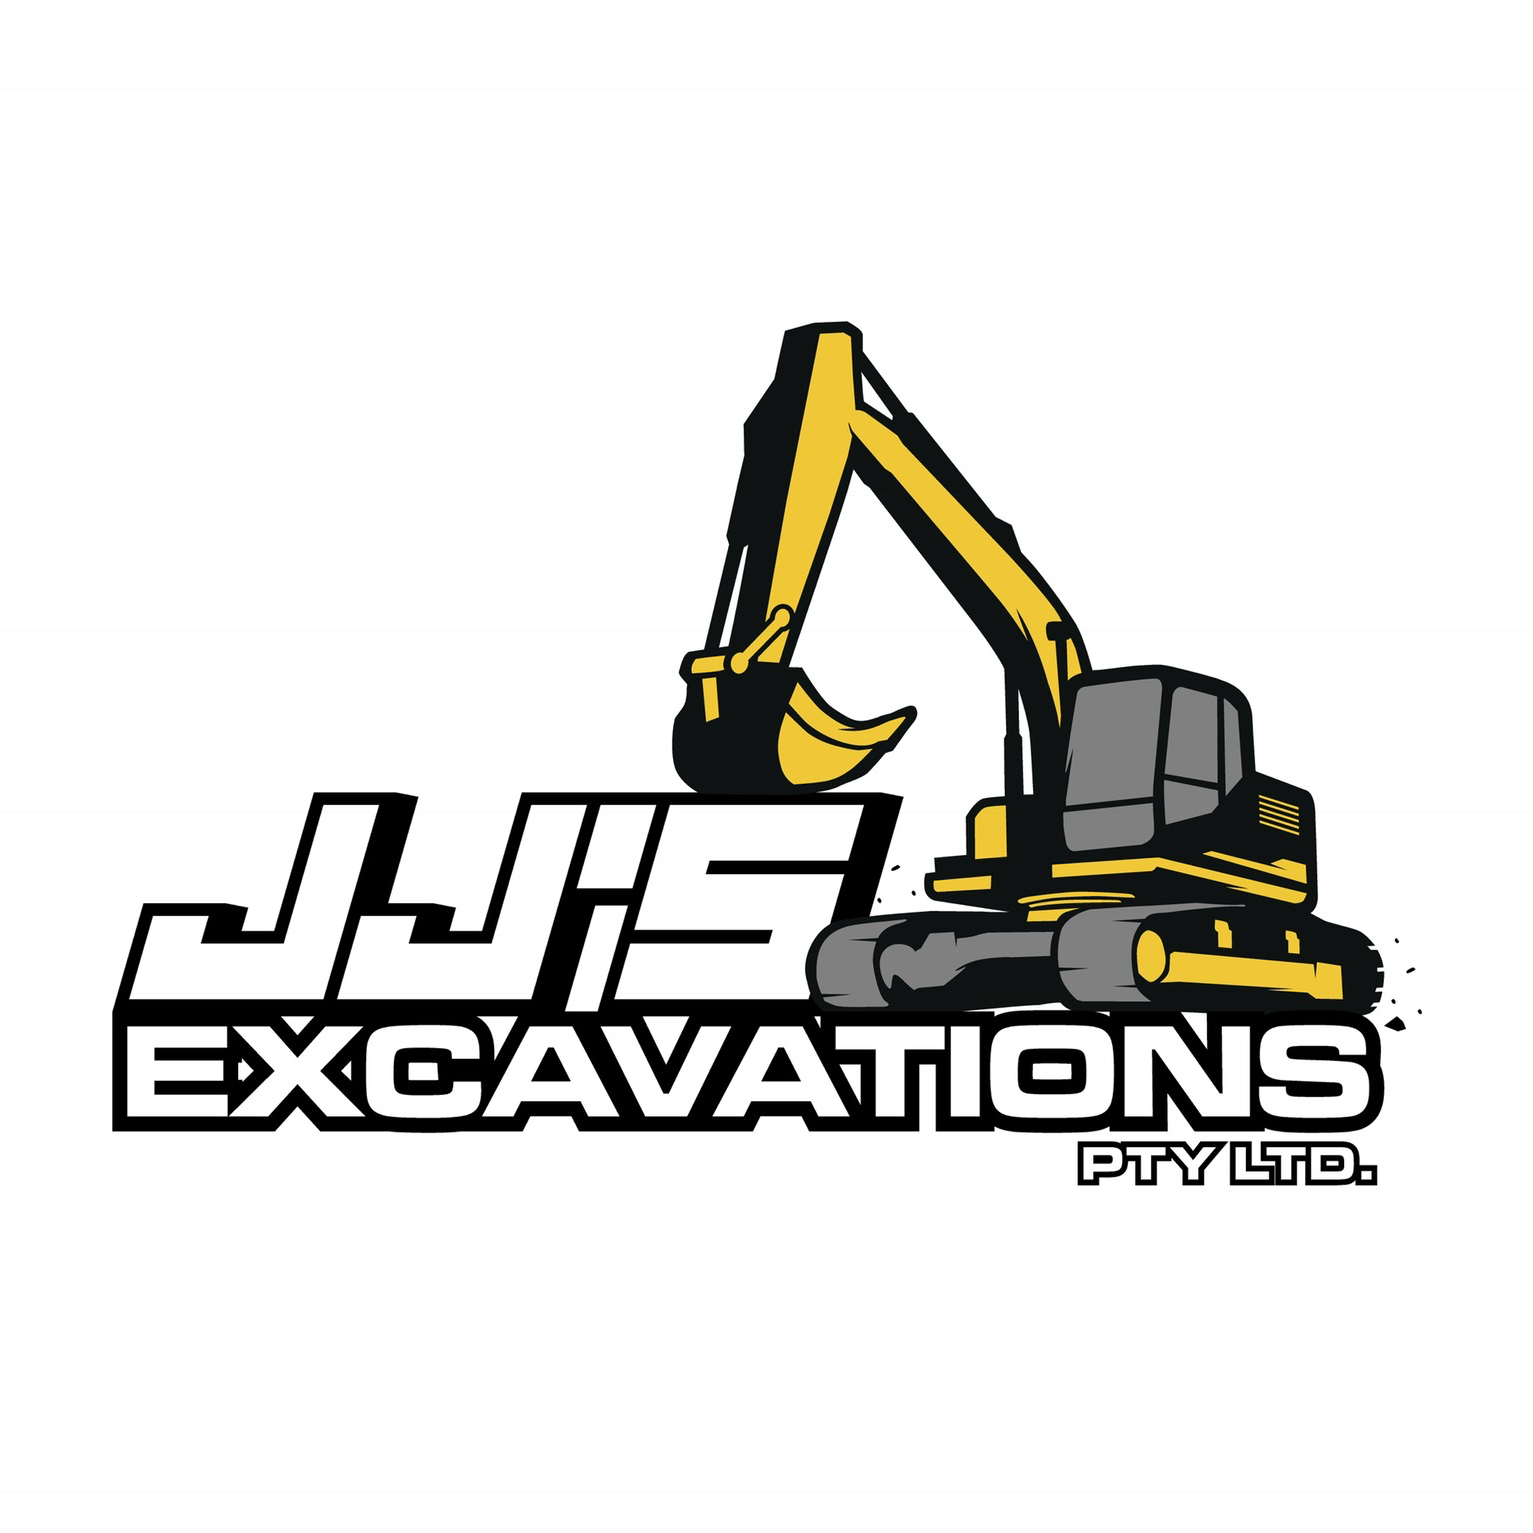 jj's excavations pty ltd